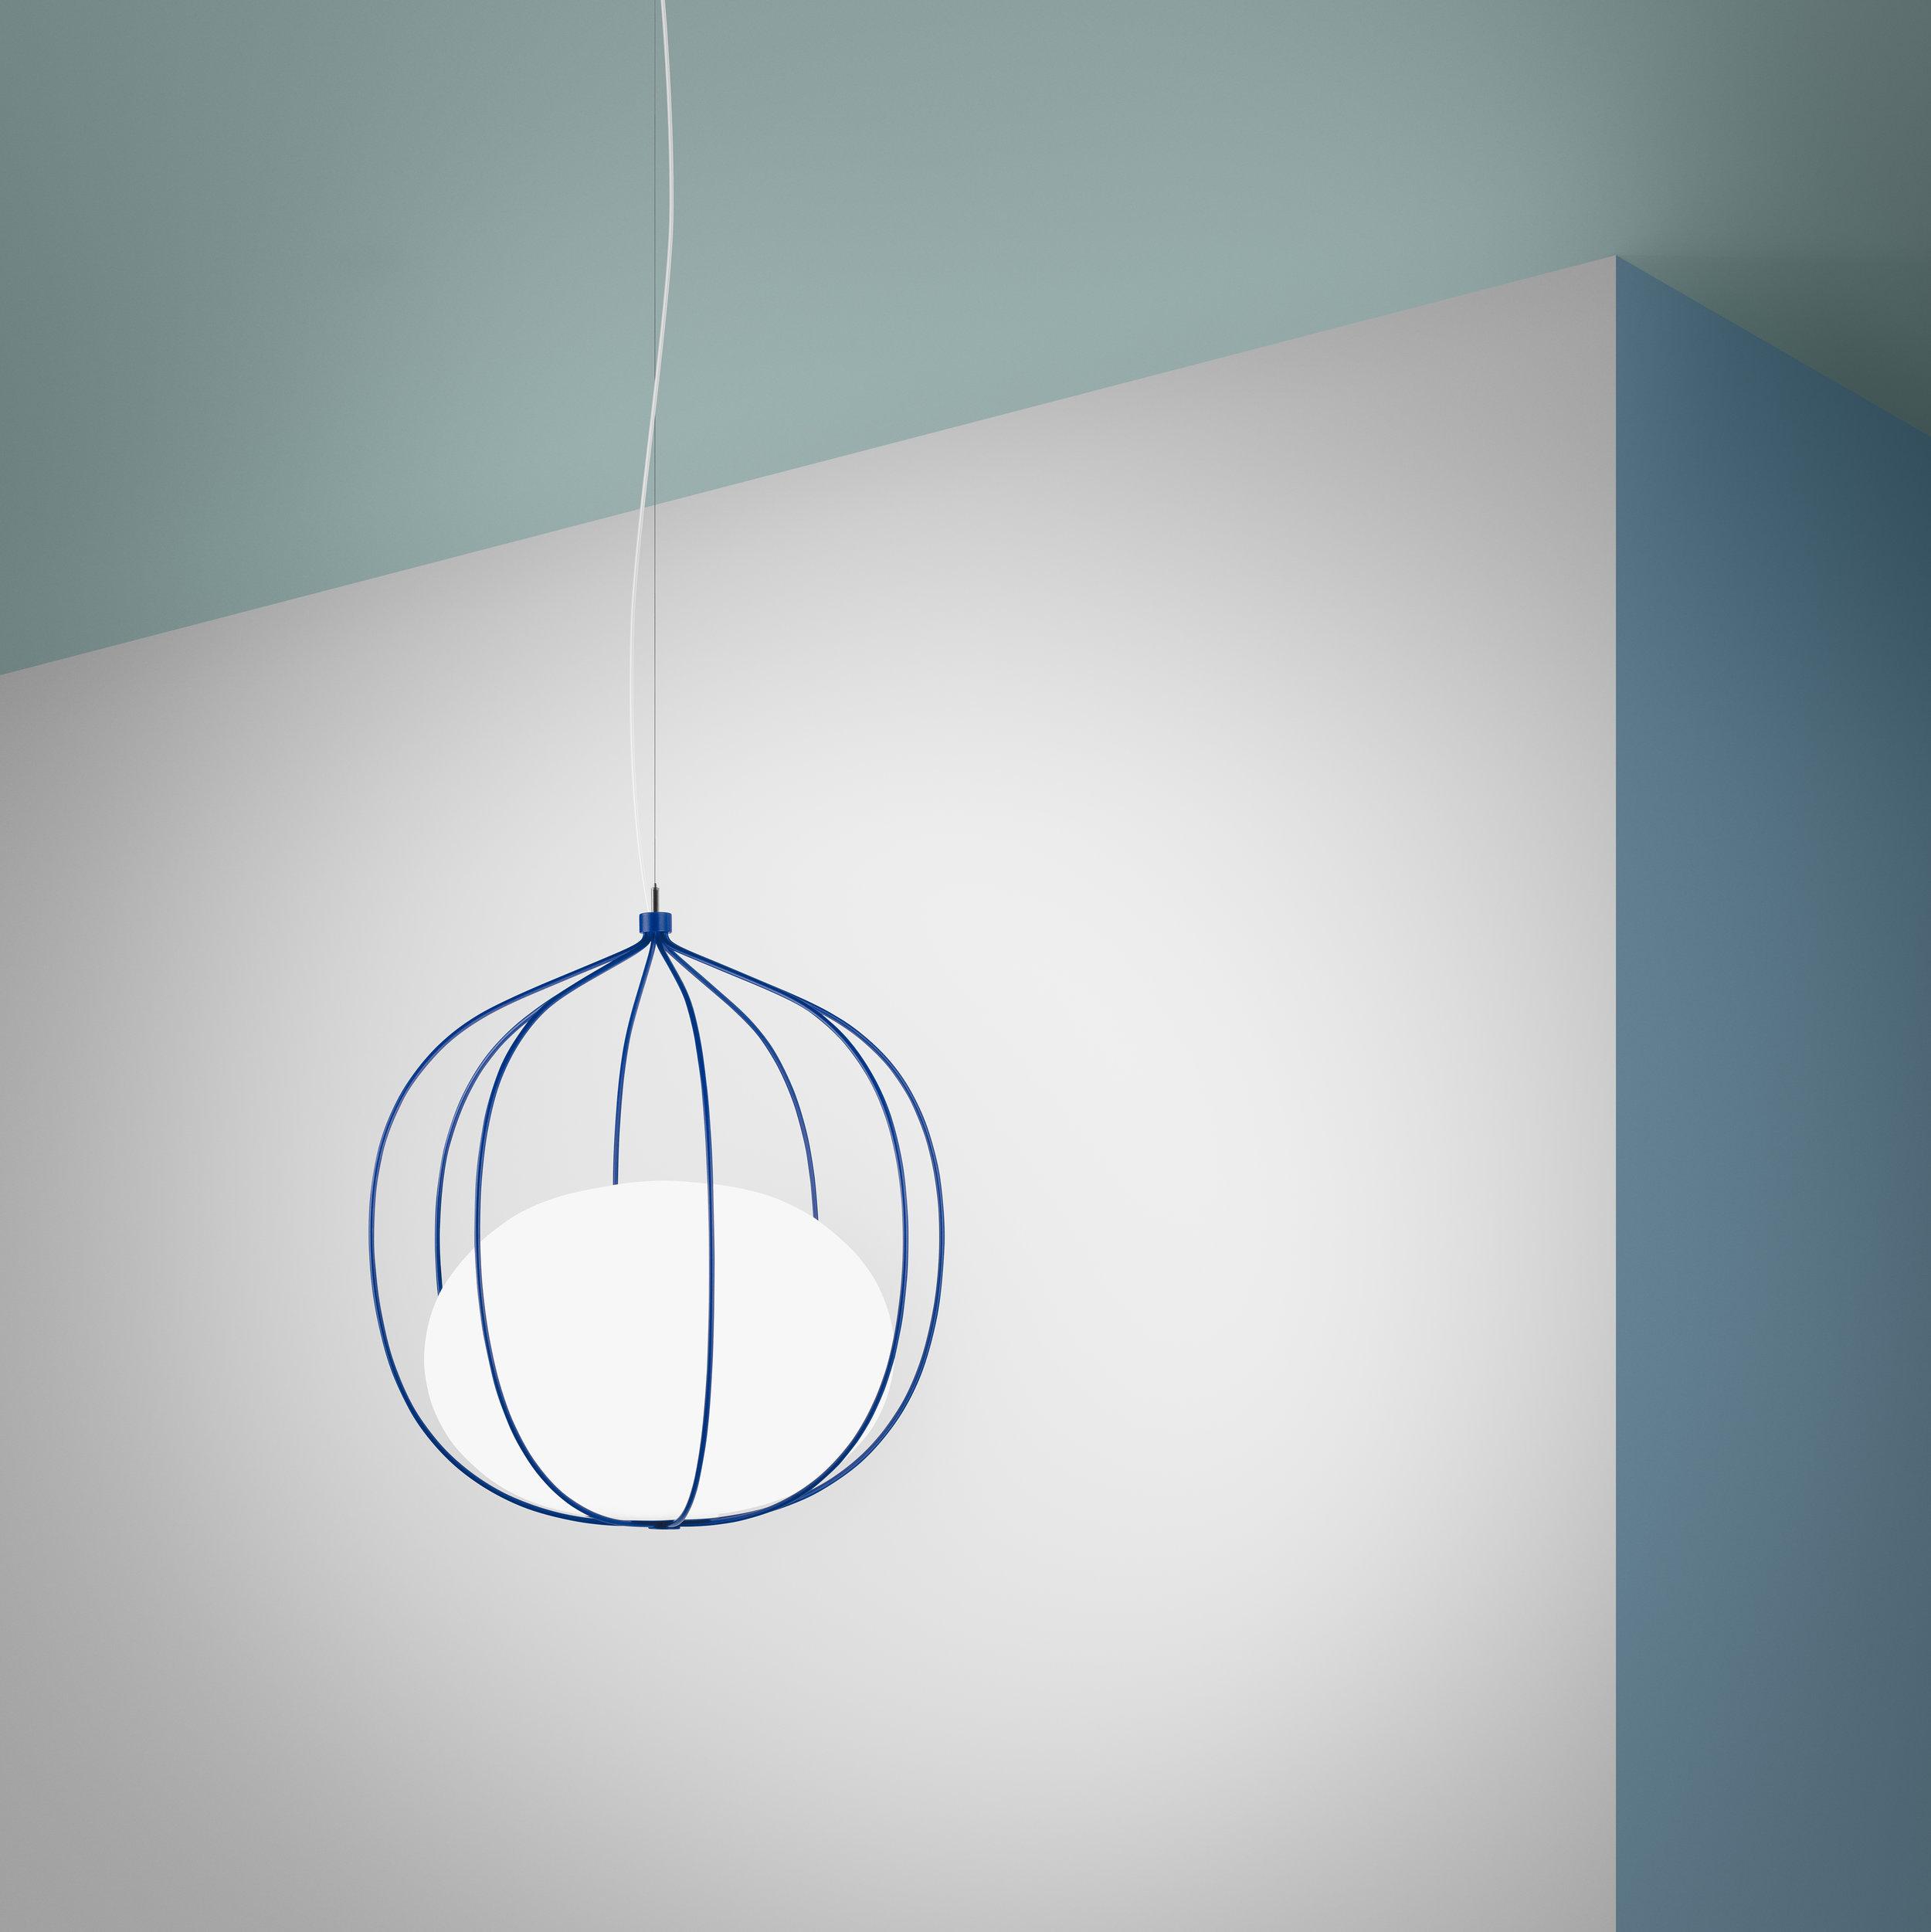 Hoop-blue-box-v2.JPG